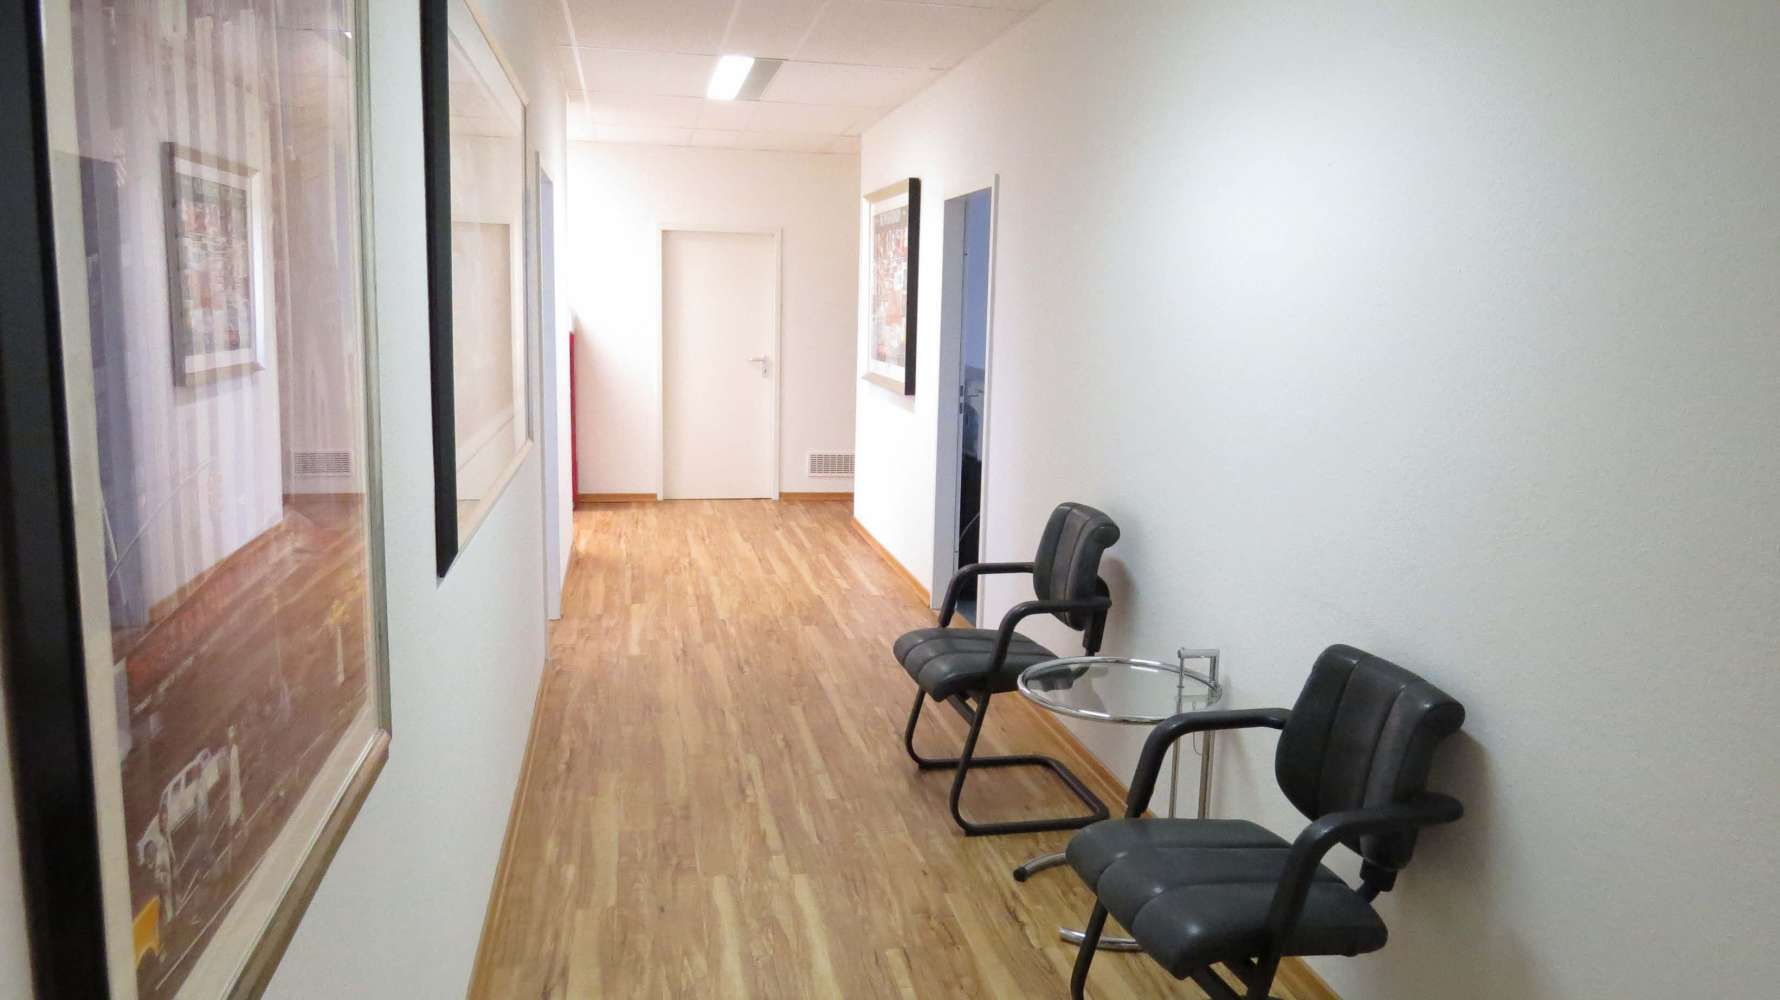 Büros Hamburg, 22085 - Büro - Hamburg, Uhlenhorst - H0551 - 9409537